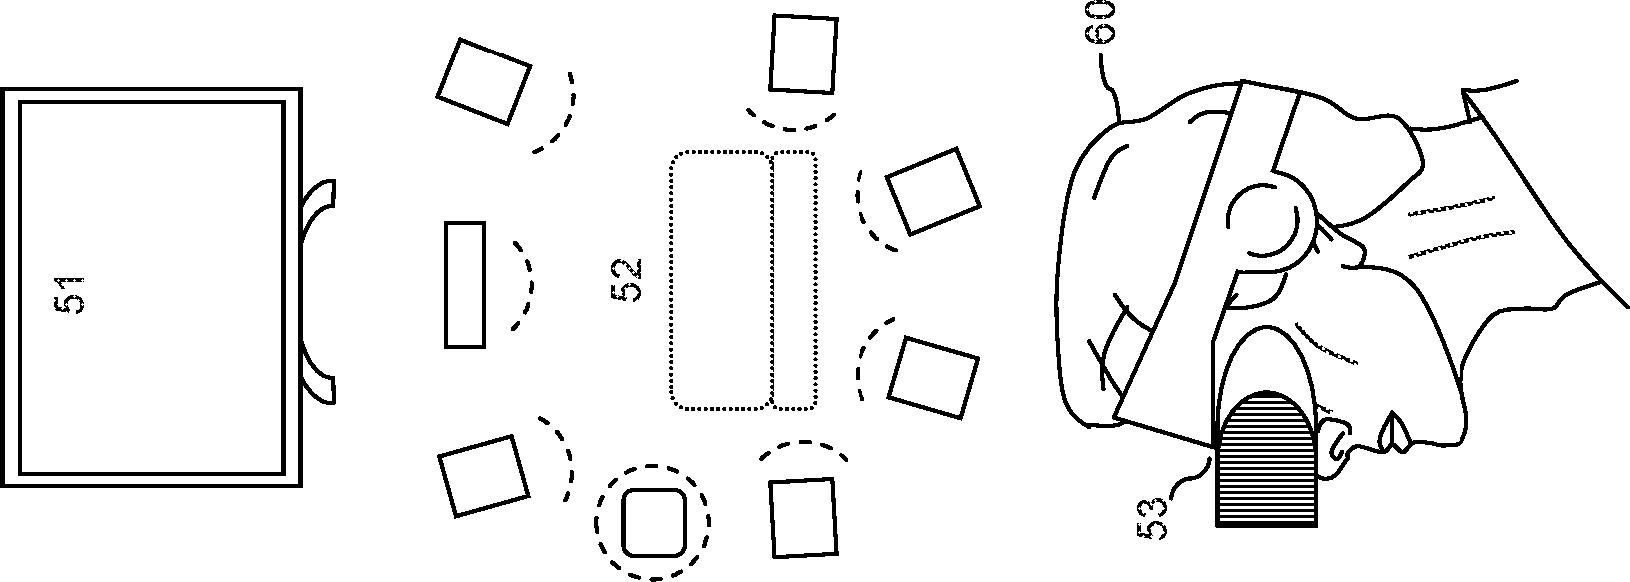 Figure GB2559792A_D0006